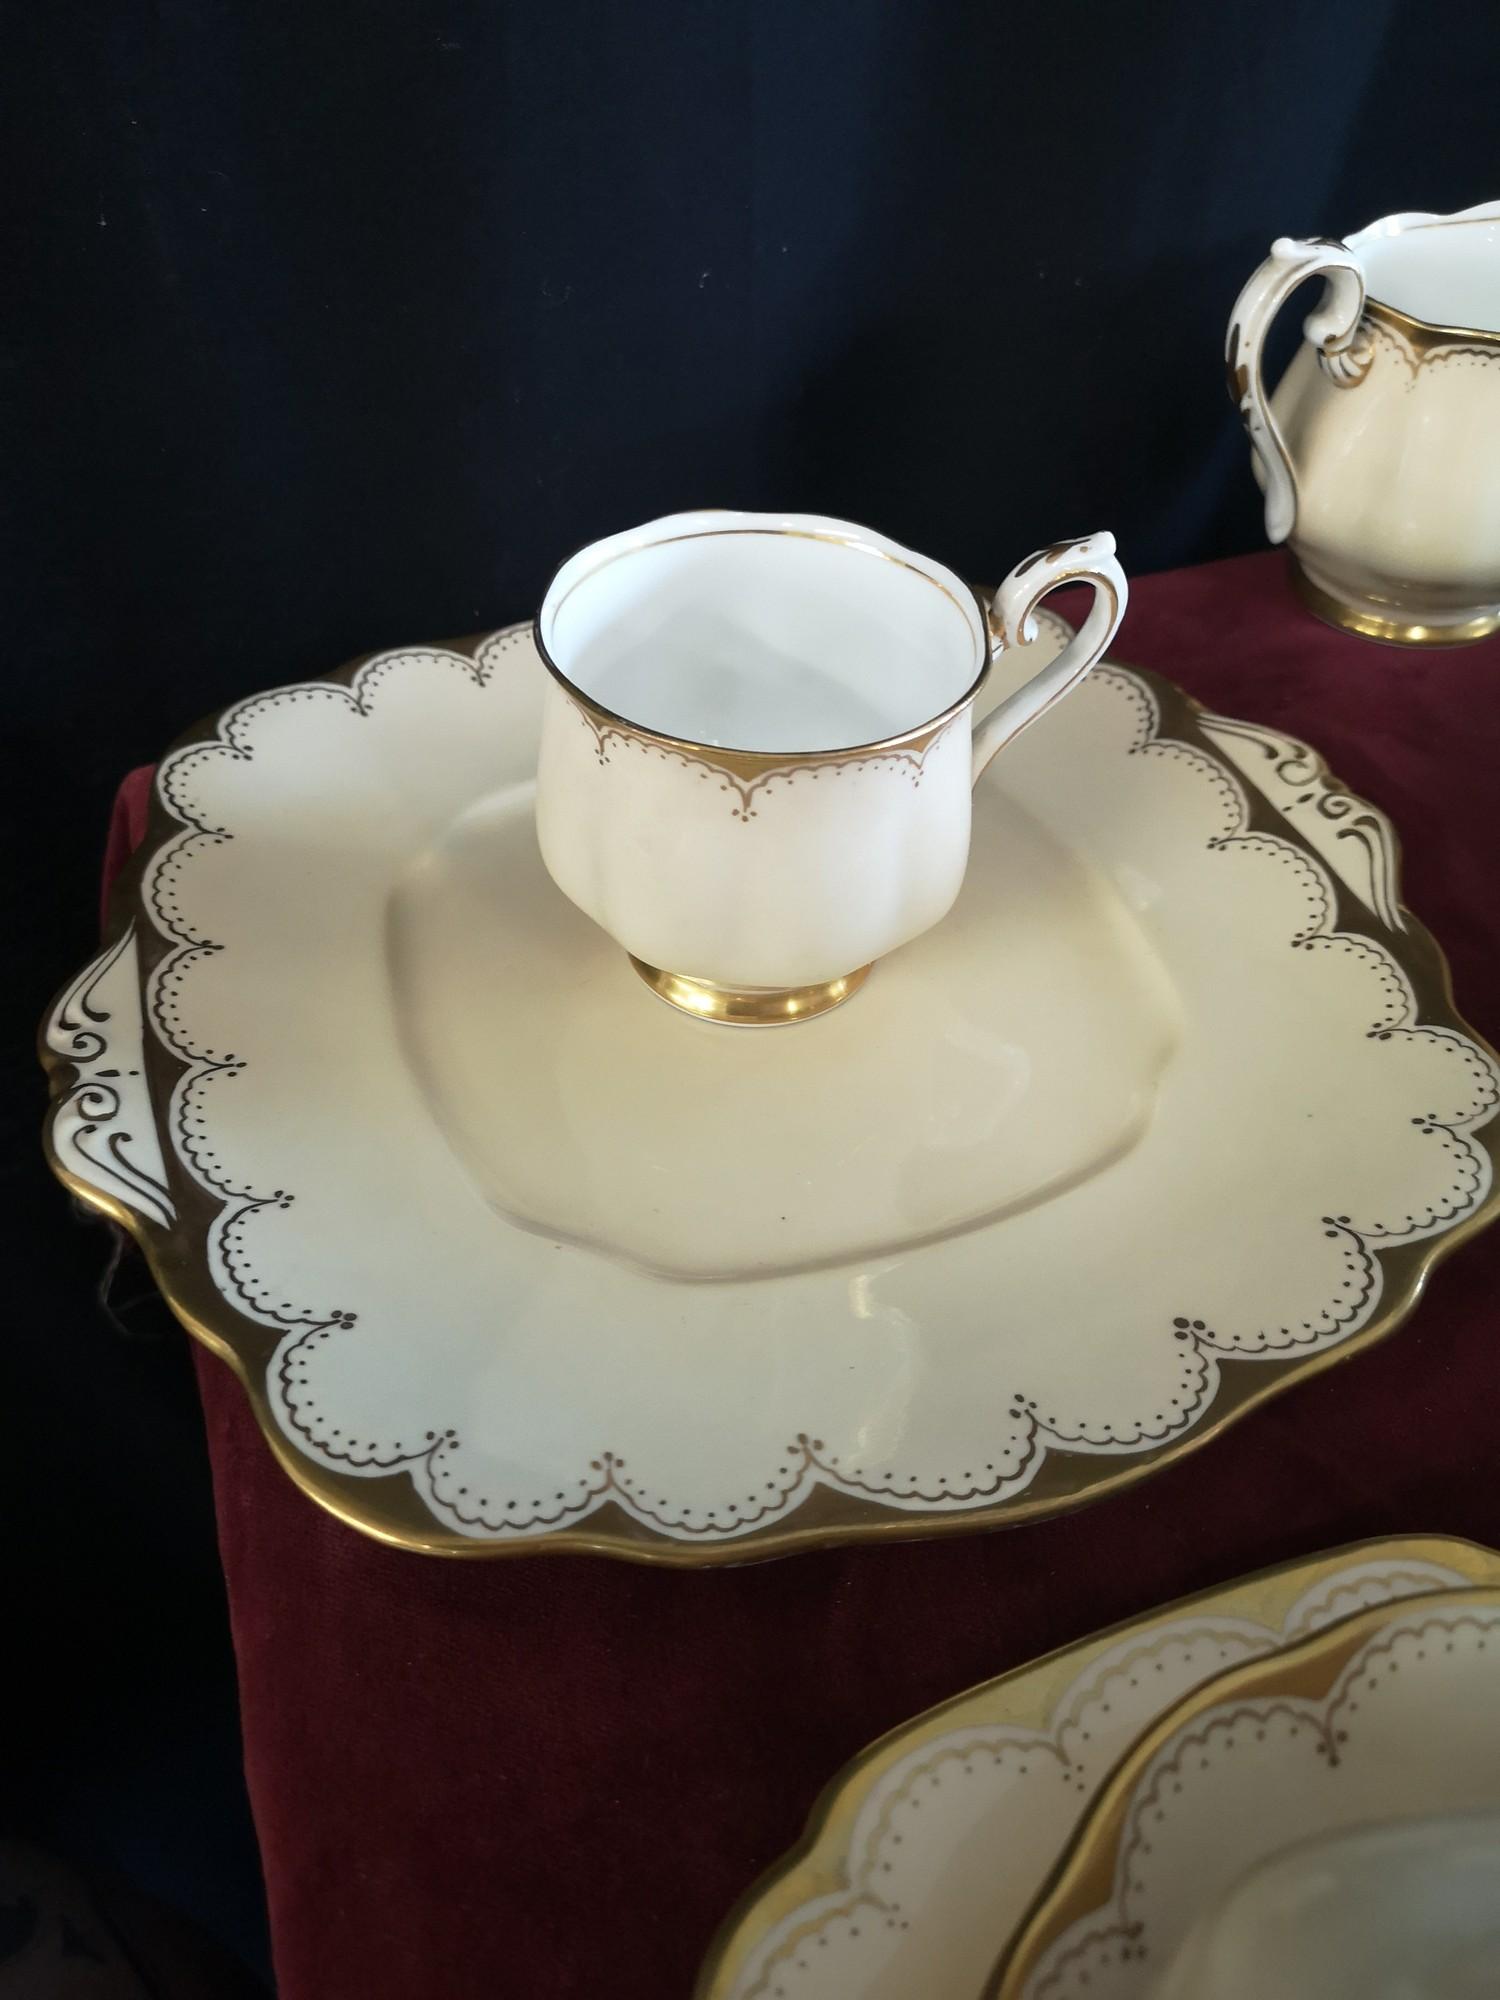 Large 1900s Royal Albert gilt tea set, set in cream back ground. - Image 5 of 10